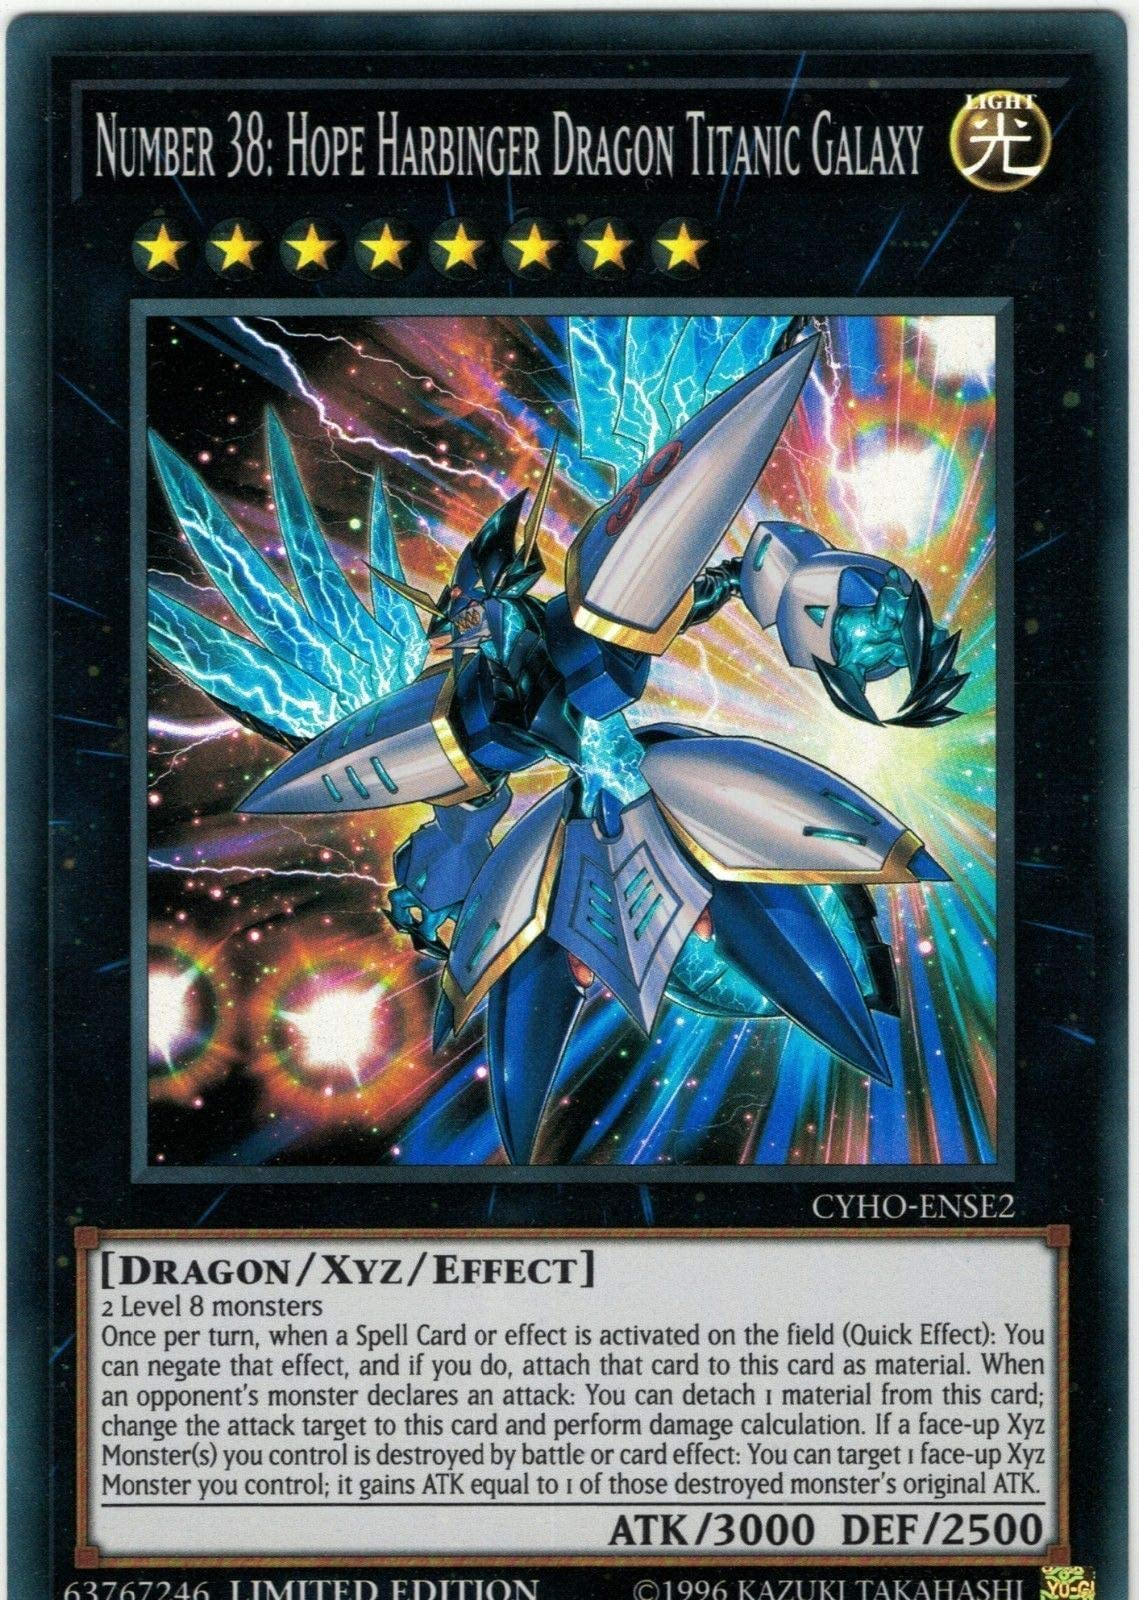 YuGiOh 1x Number 5: Doom Chimera Dragon TCGAtzenJens DANE-EN092